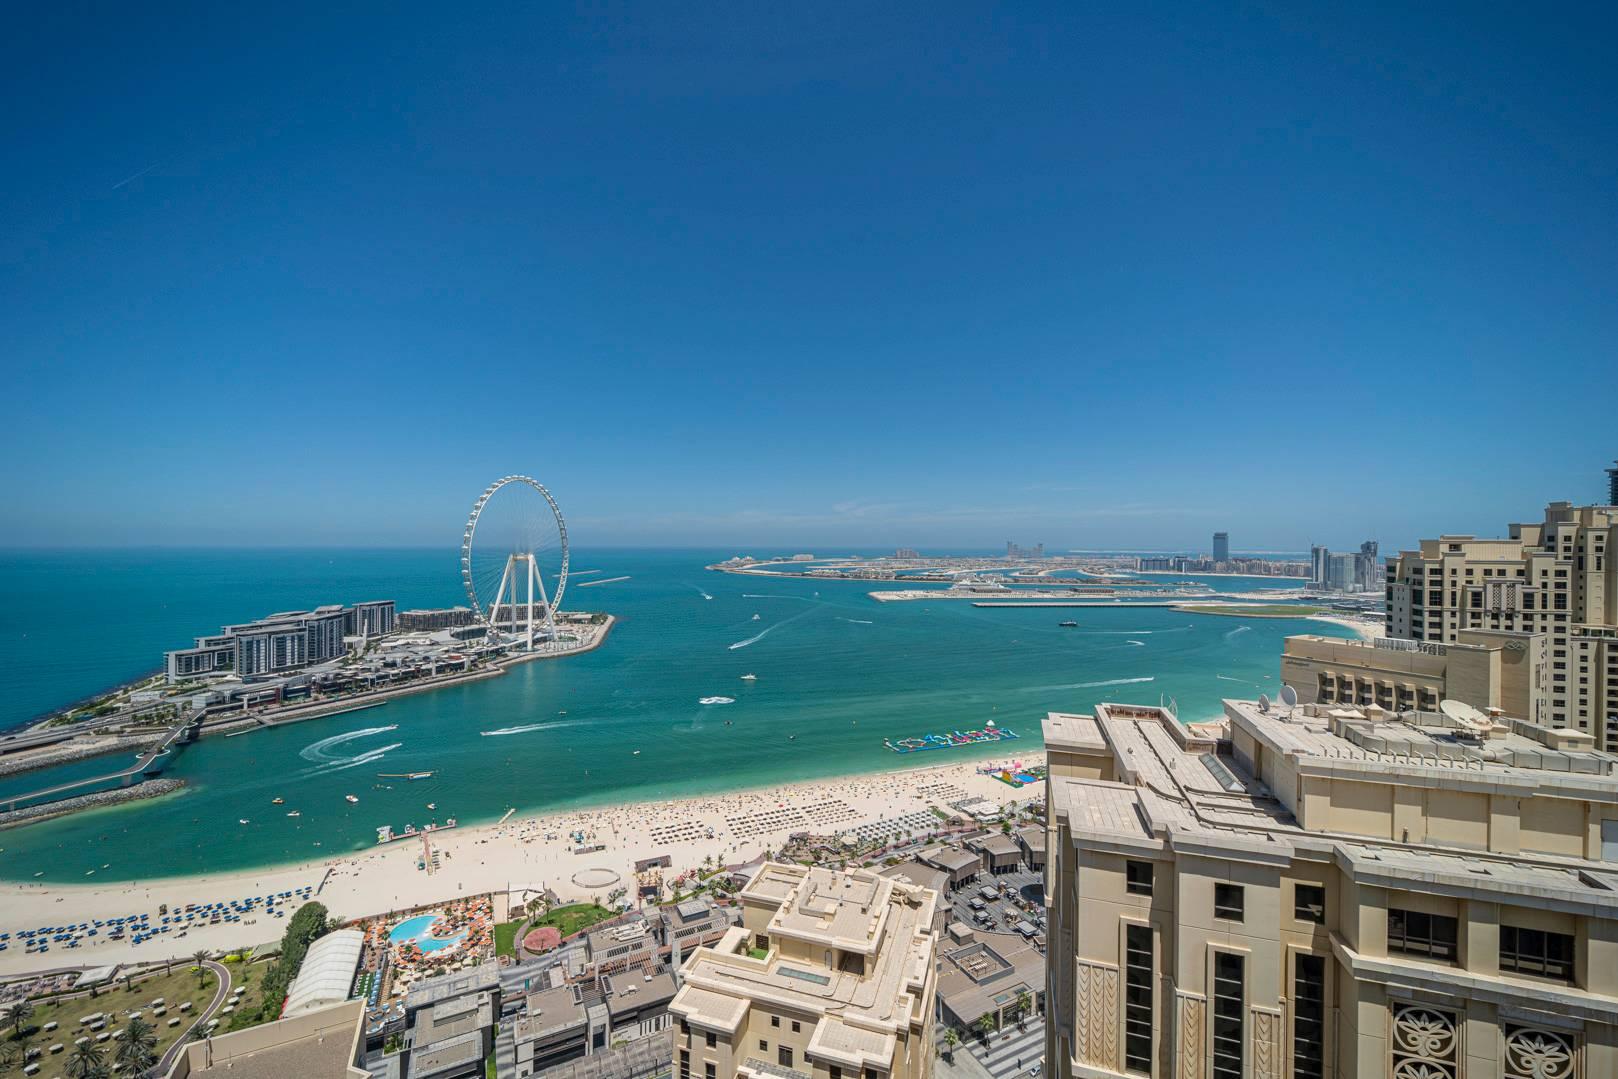 Апартаменты, sale в Amwaj Дубай, ОАЭ